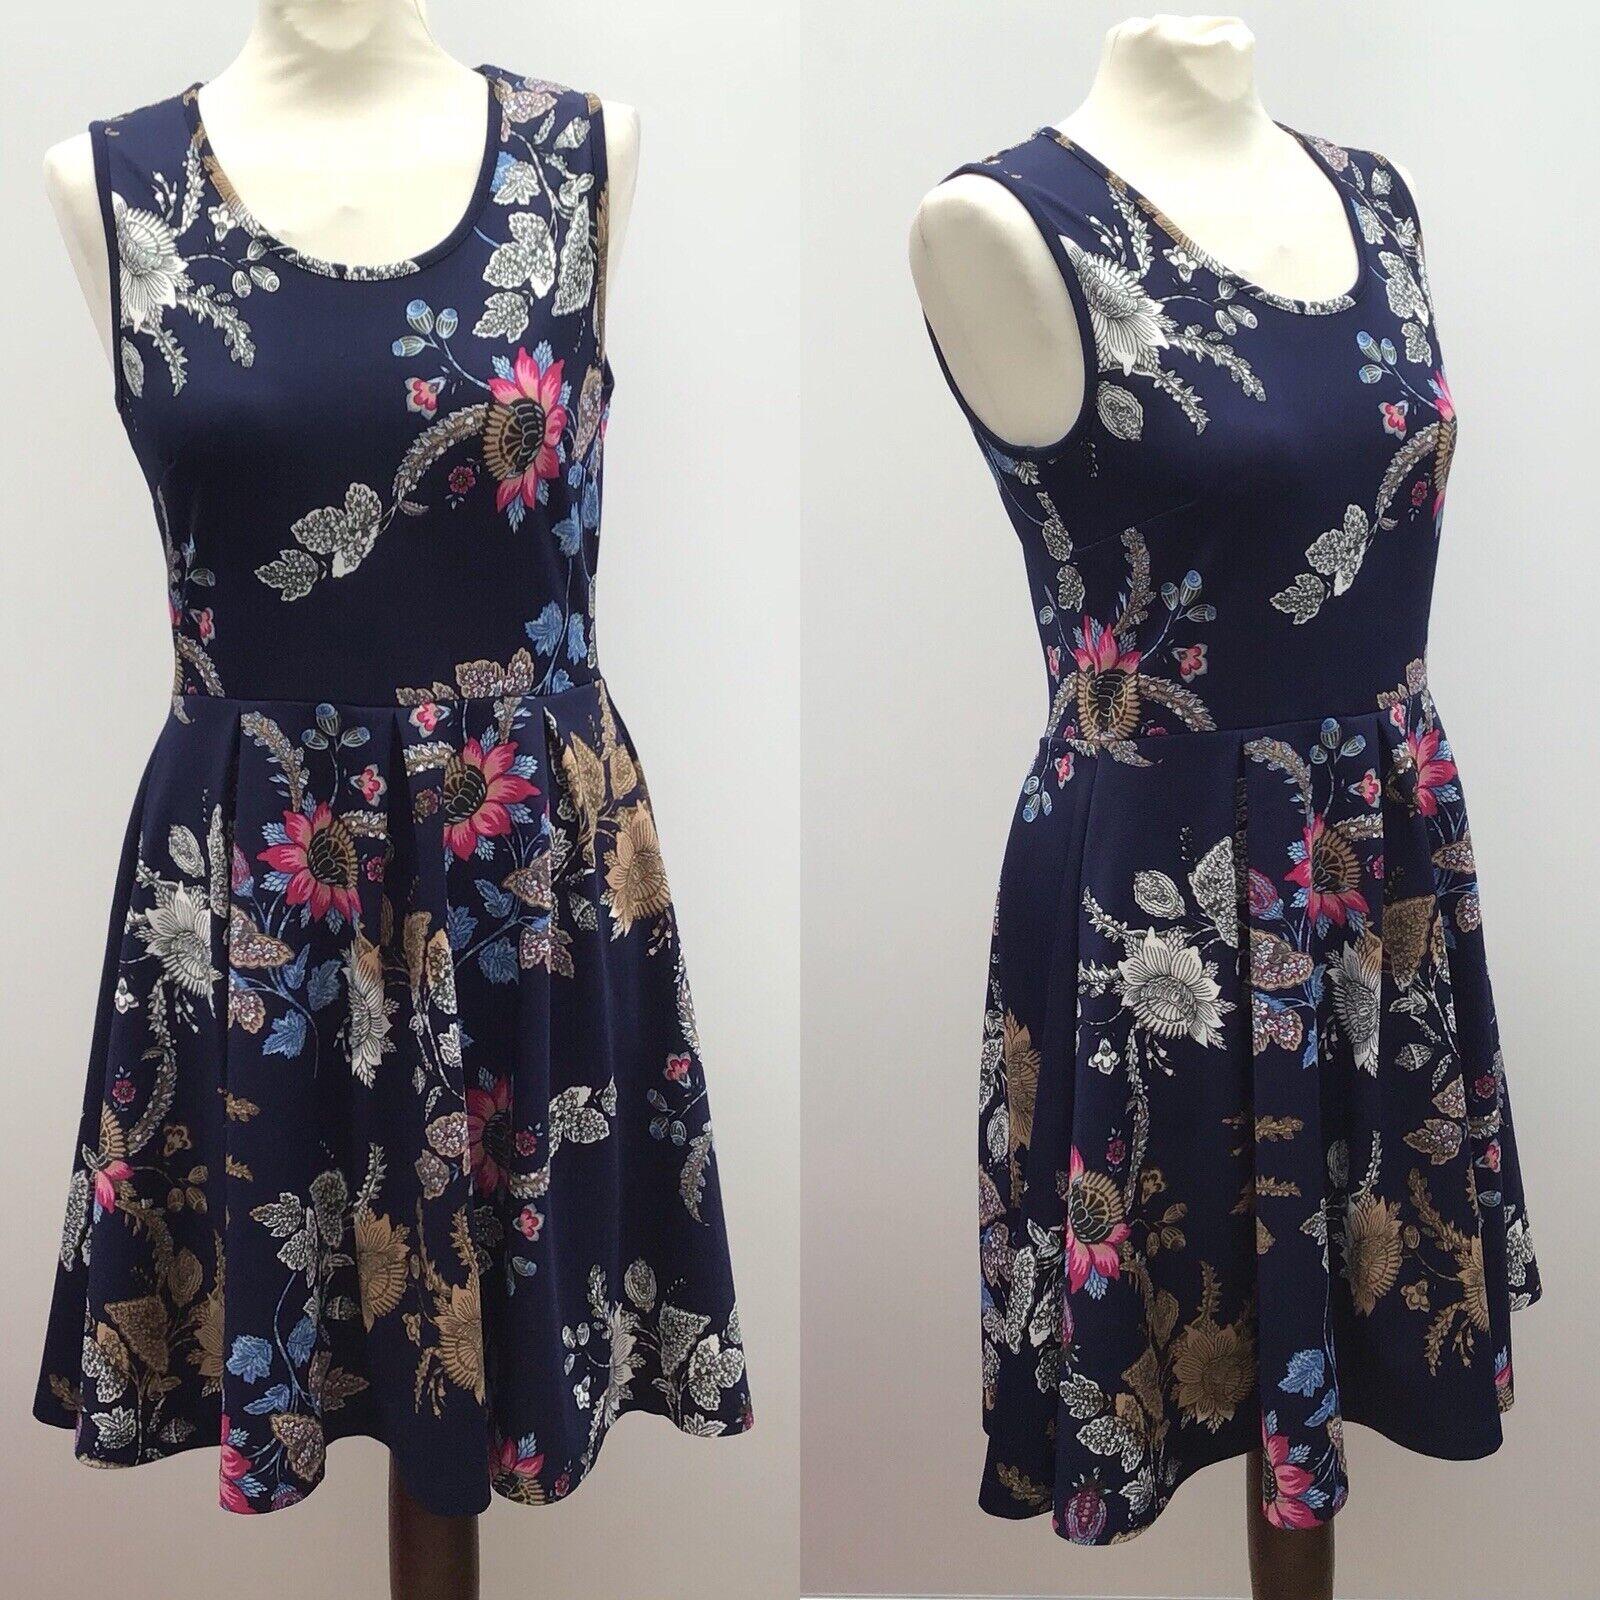 Joe Browns Navy bluee Floral Print Sleeveless Dress Size 10